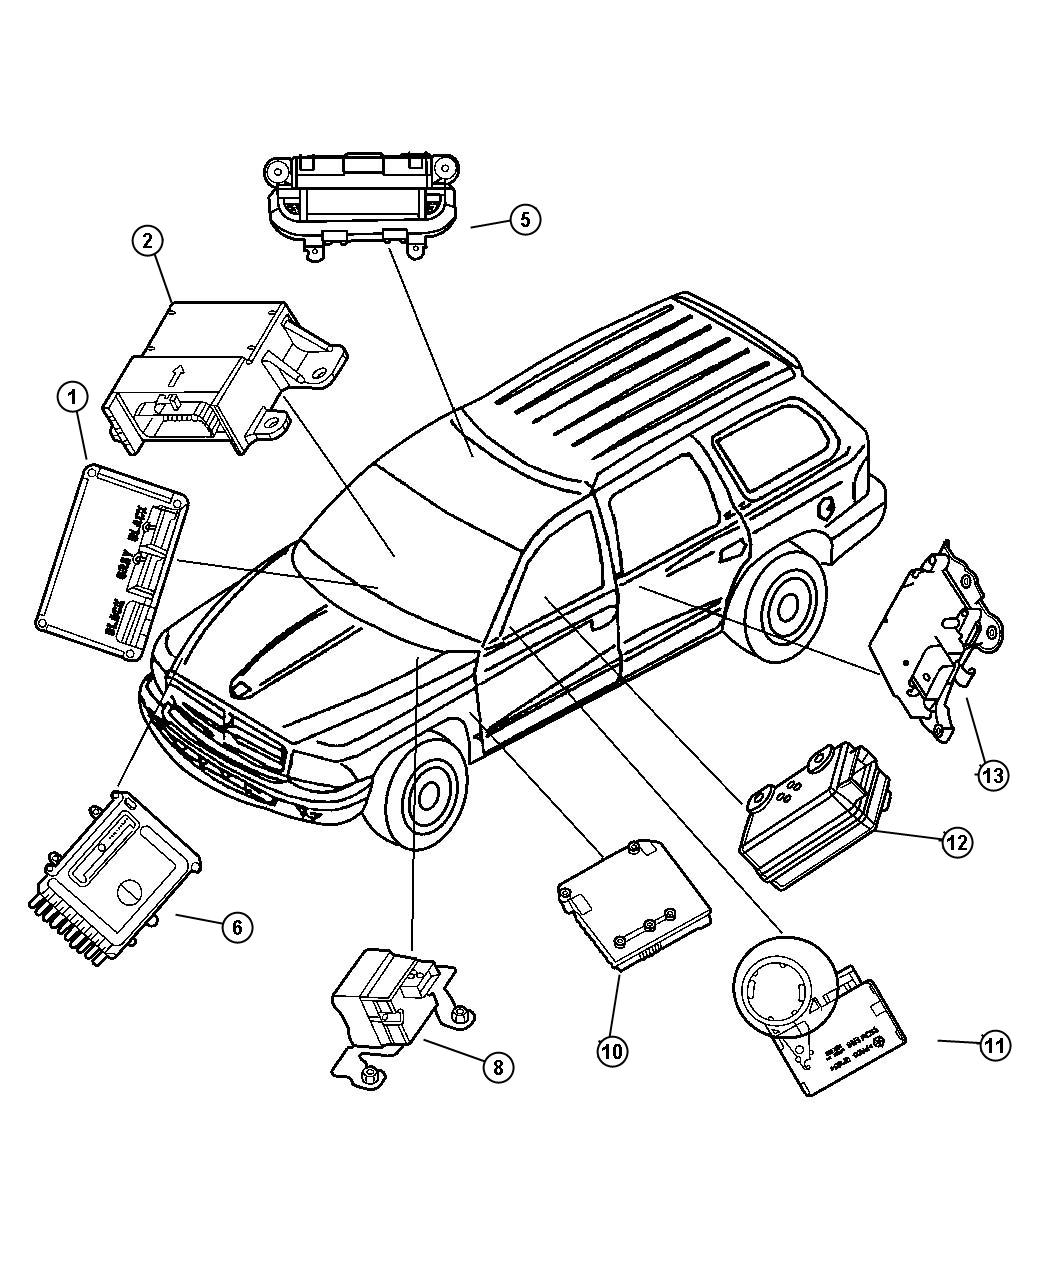 2005 dodge neon fuse box diagram manual